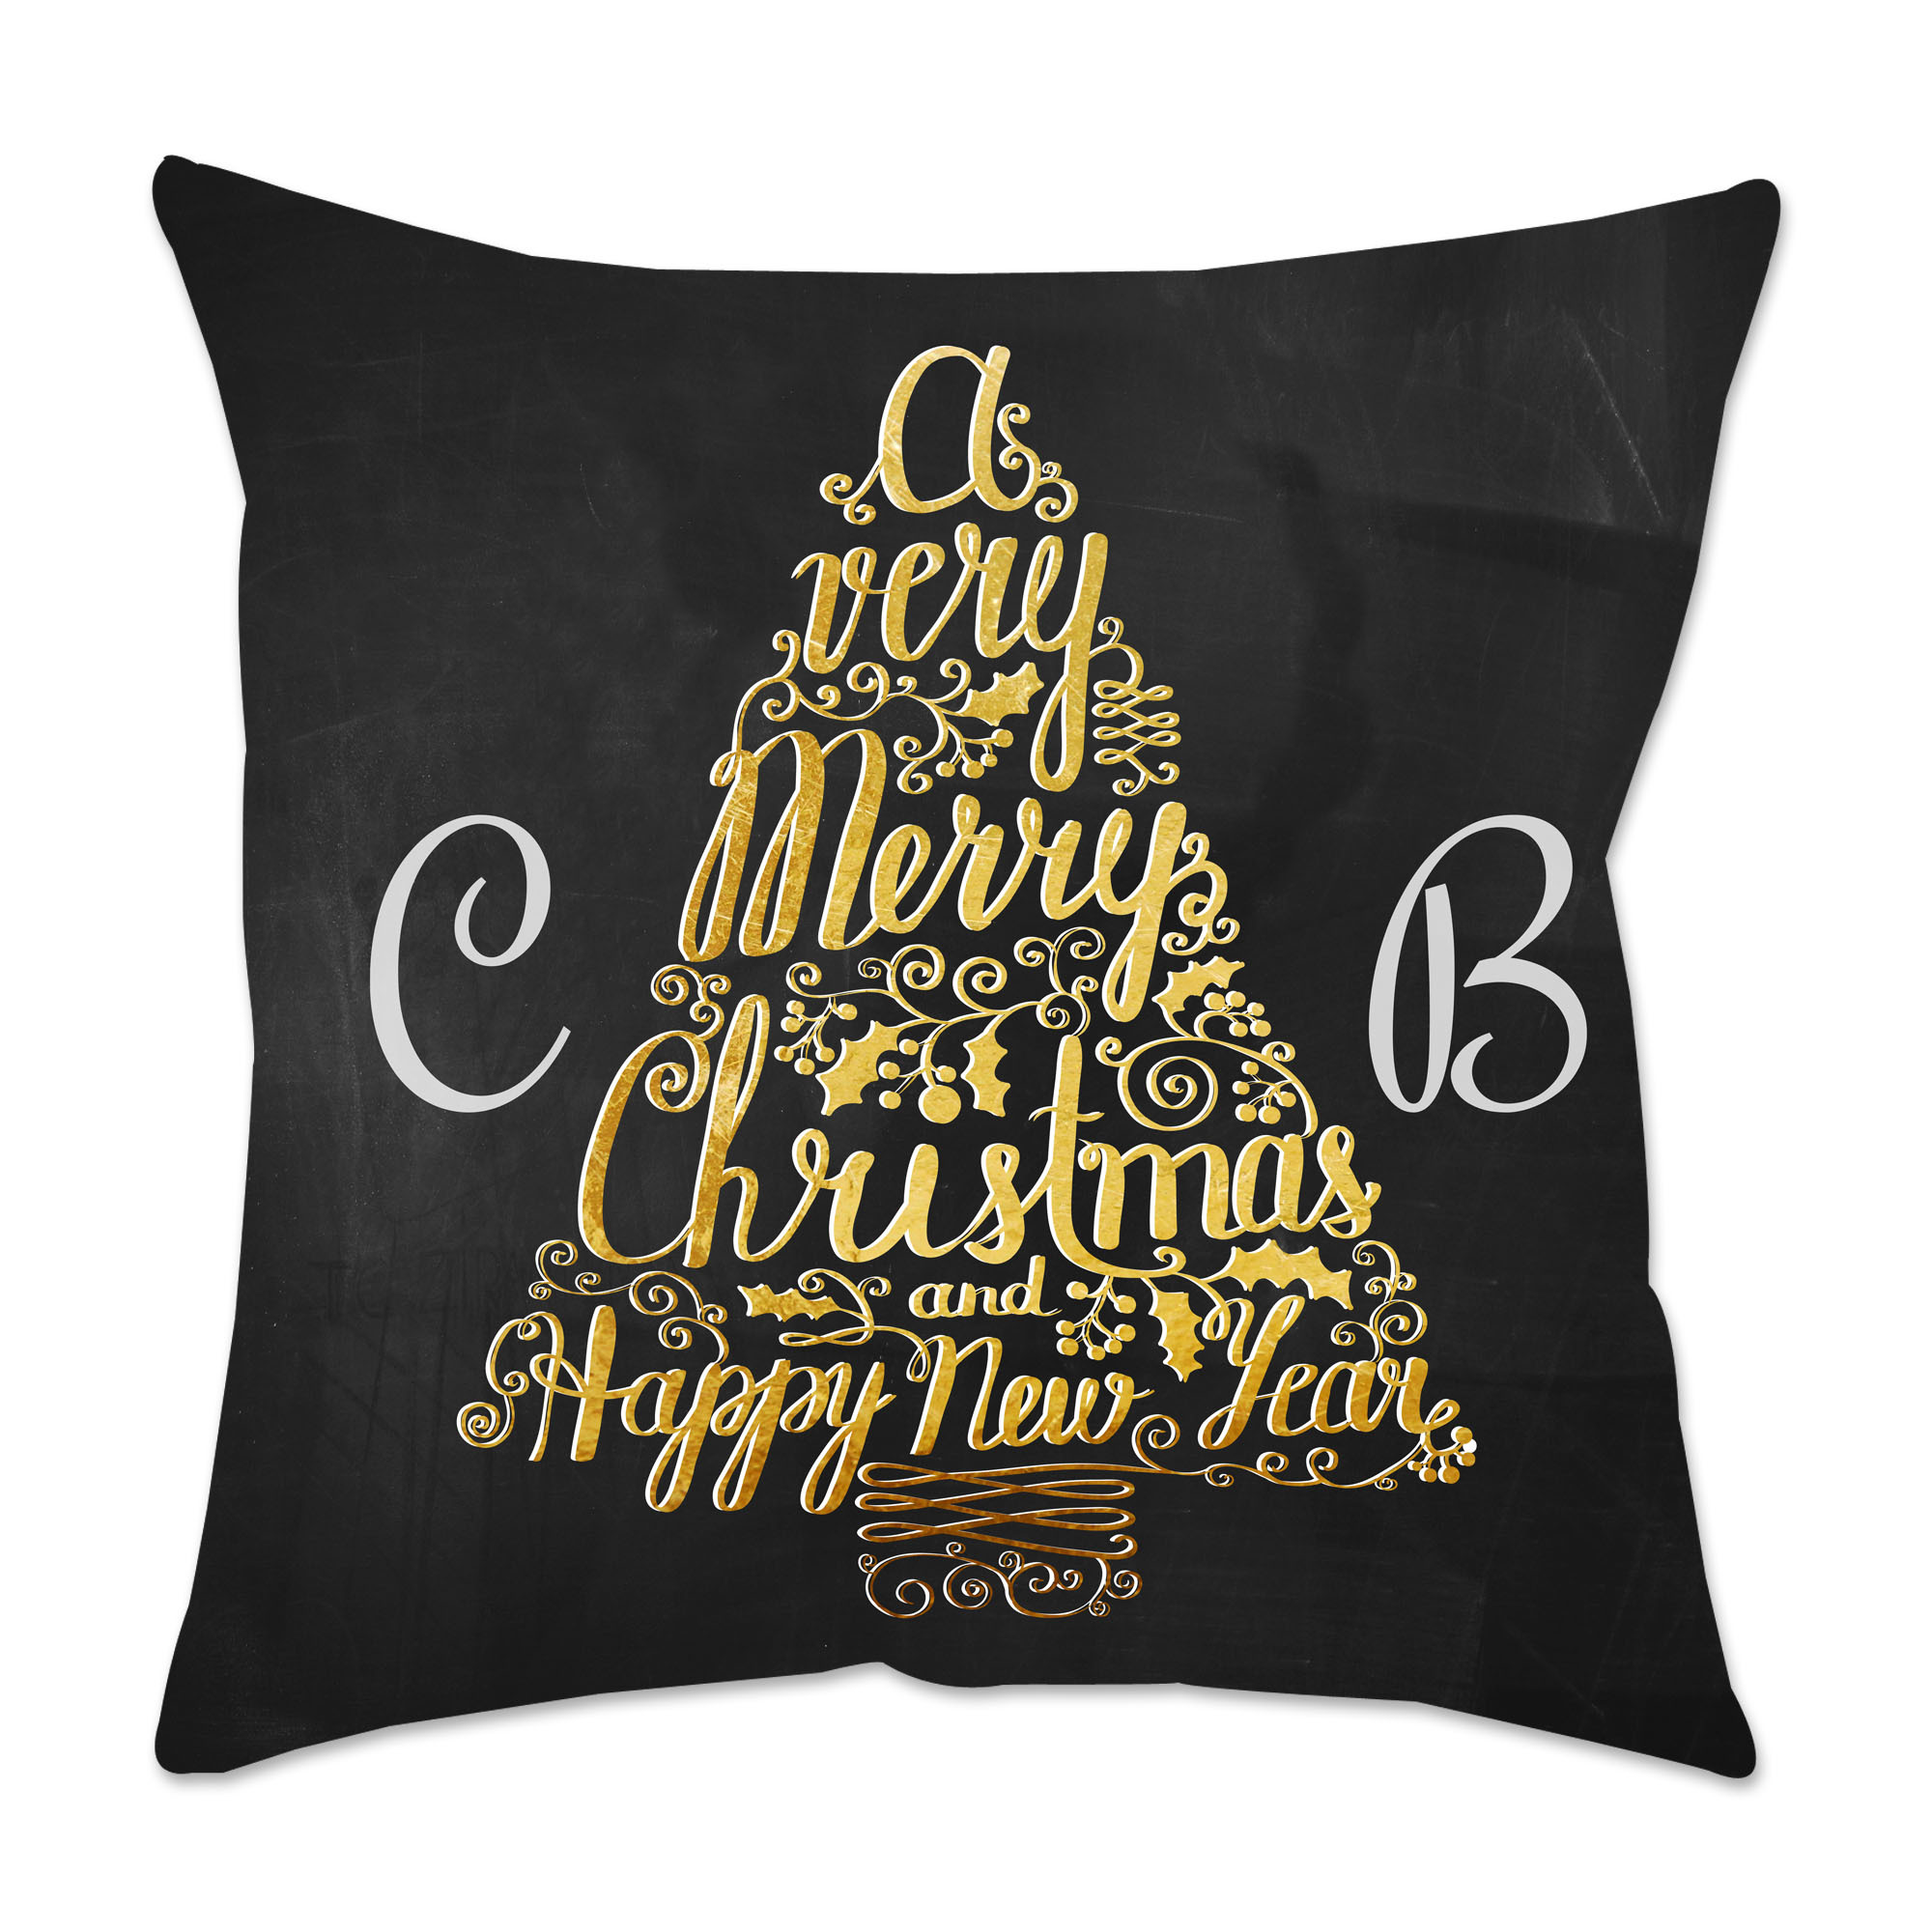 Personalized Metallic Tree Poplin Square Throw Pillow in Black